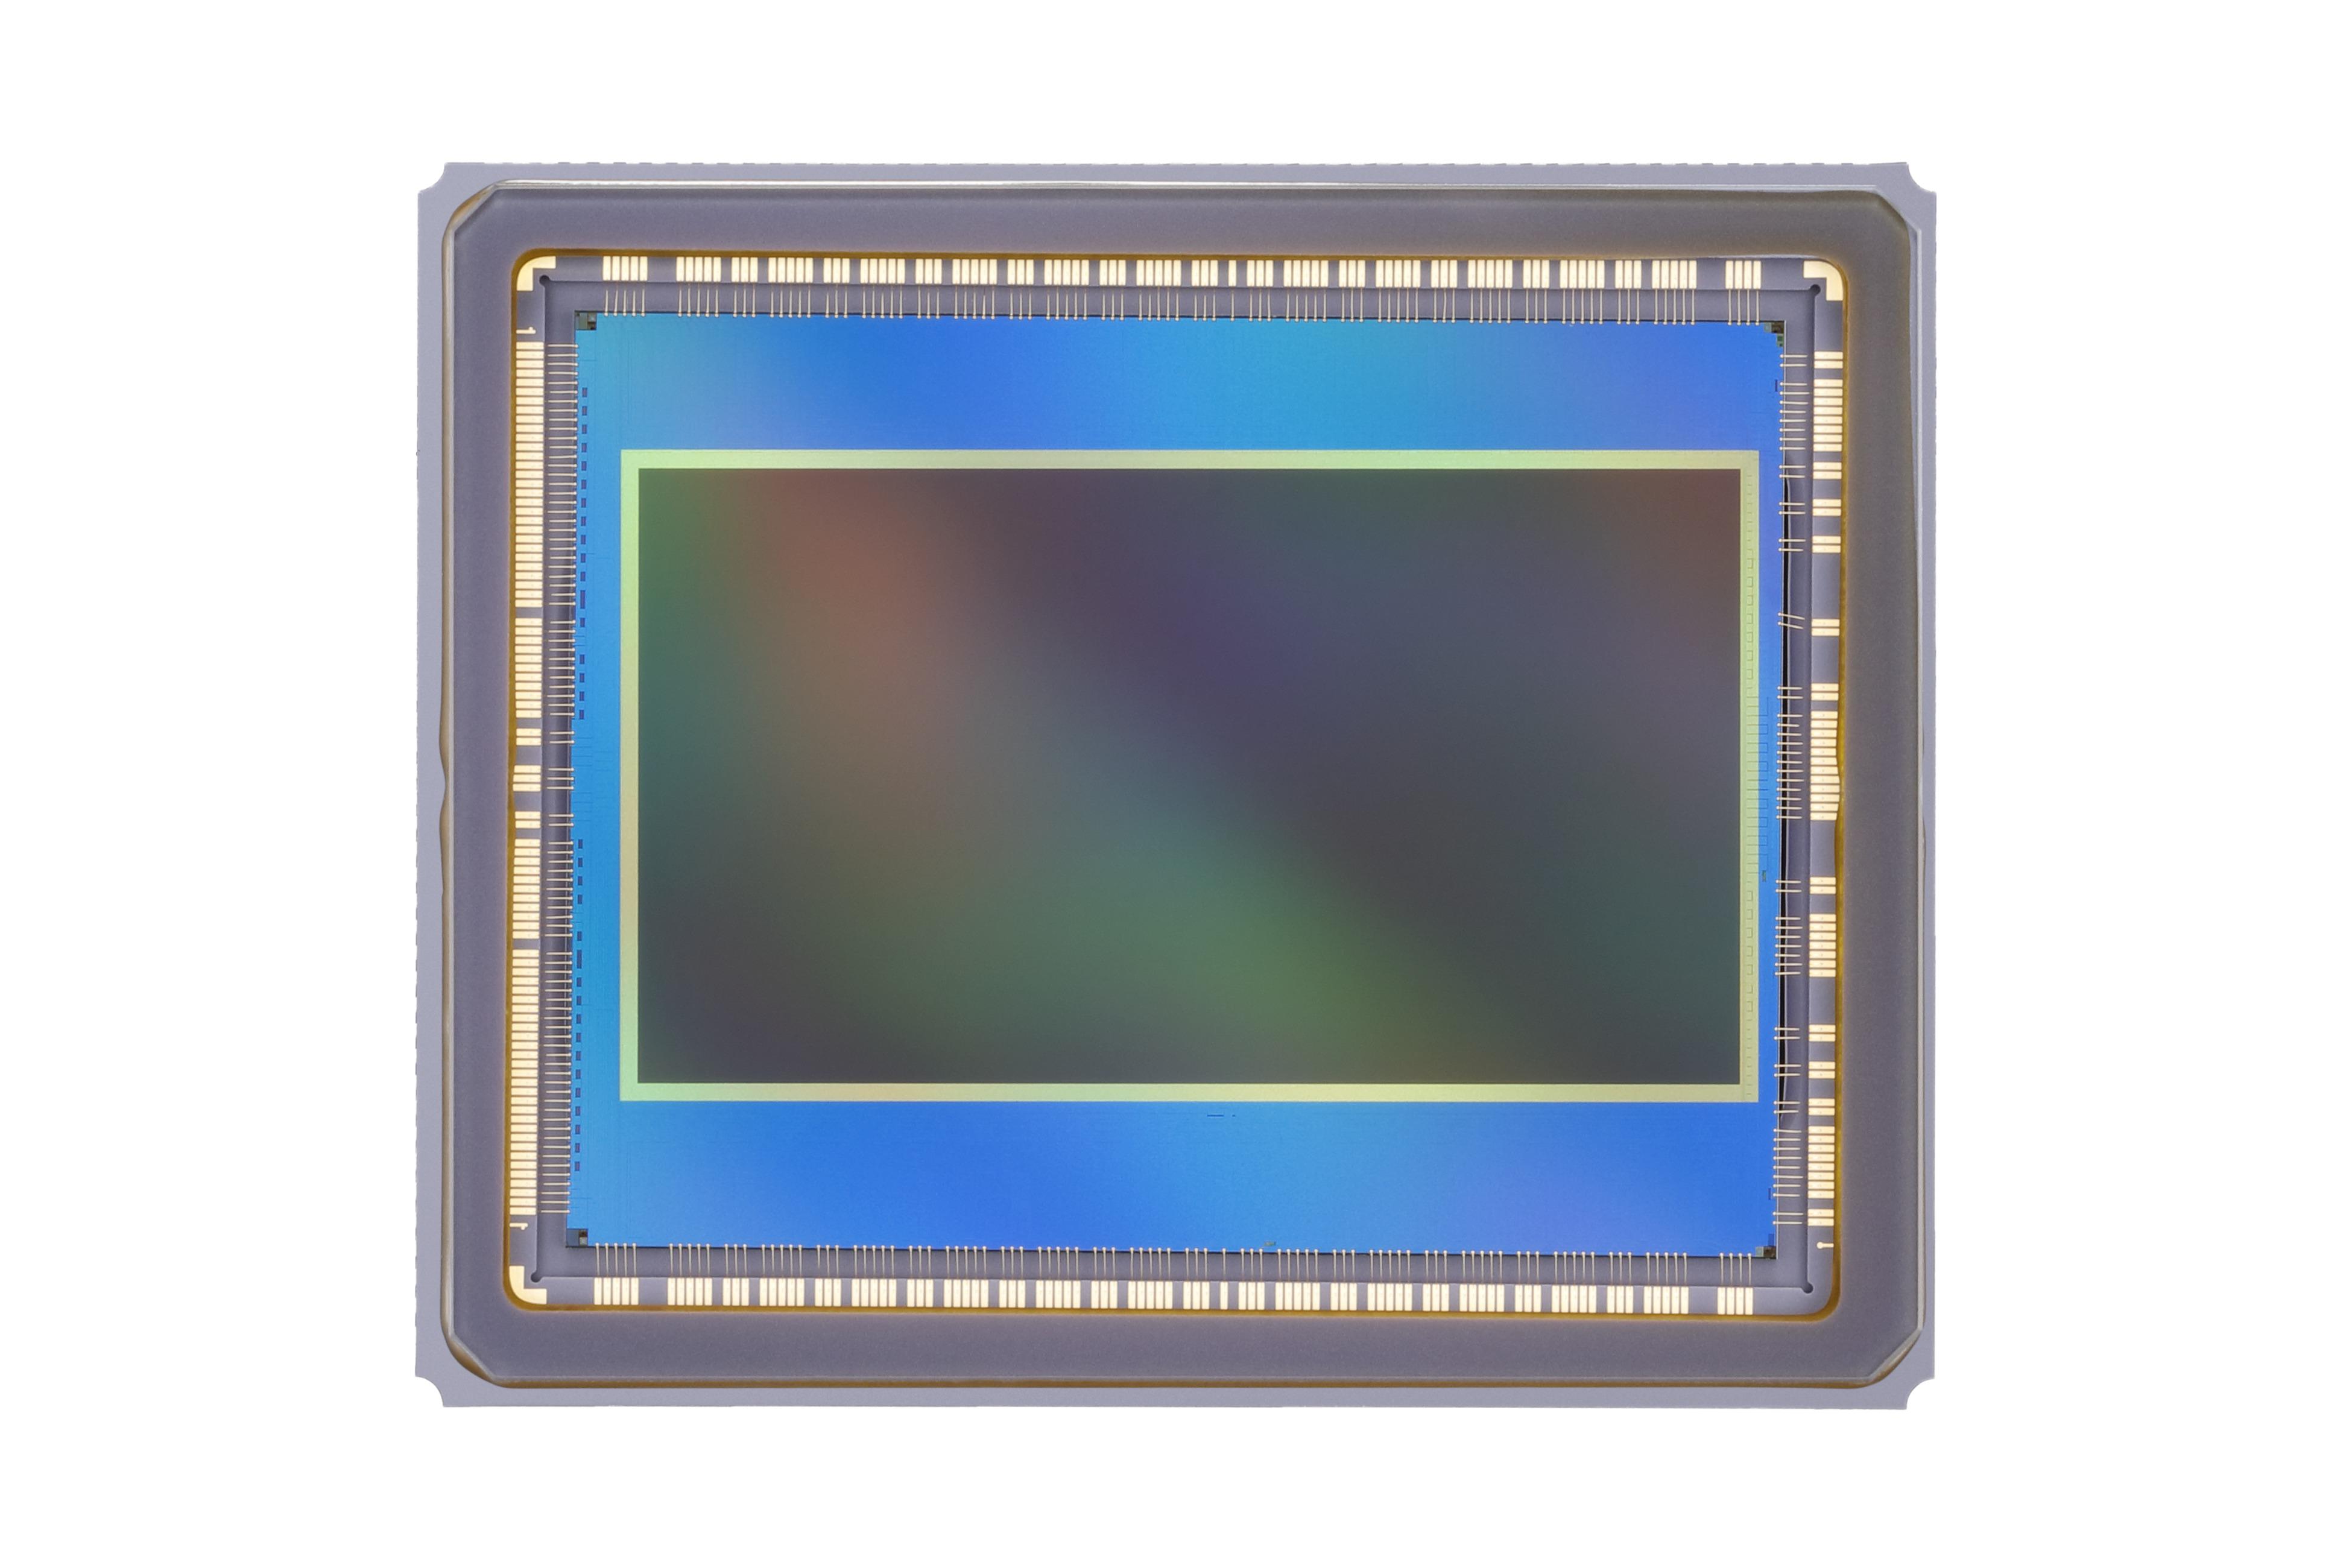 eos_c700_ff_sensor_02.jpg